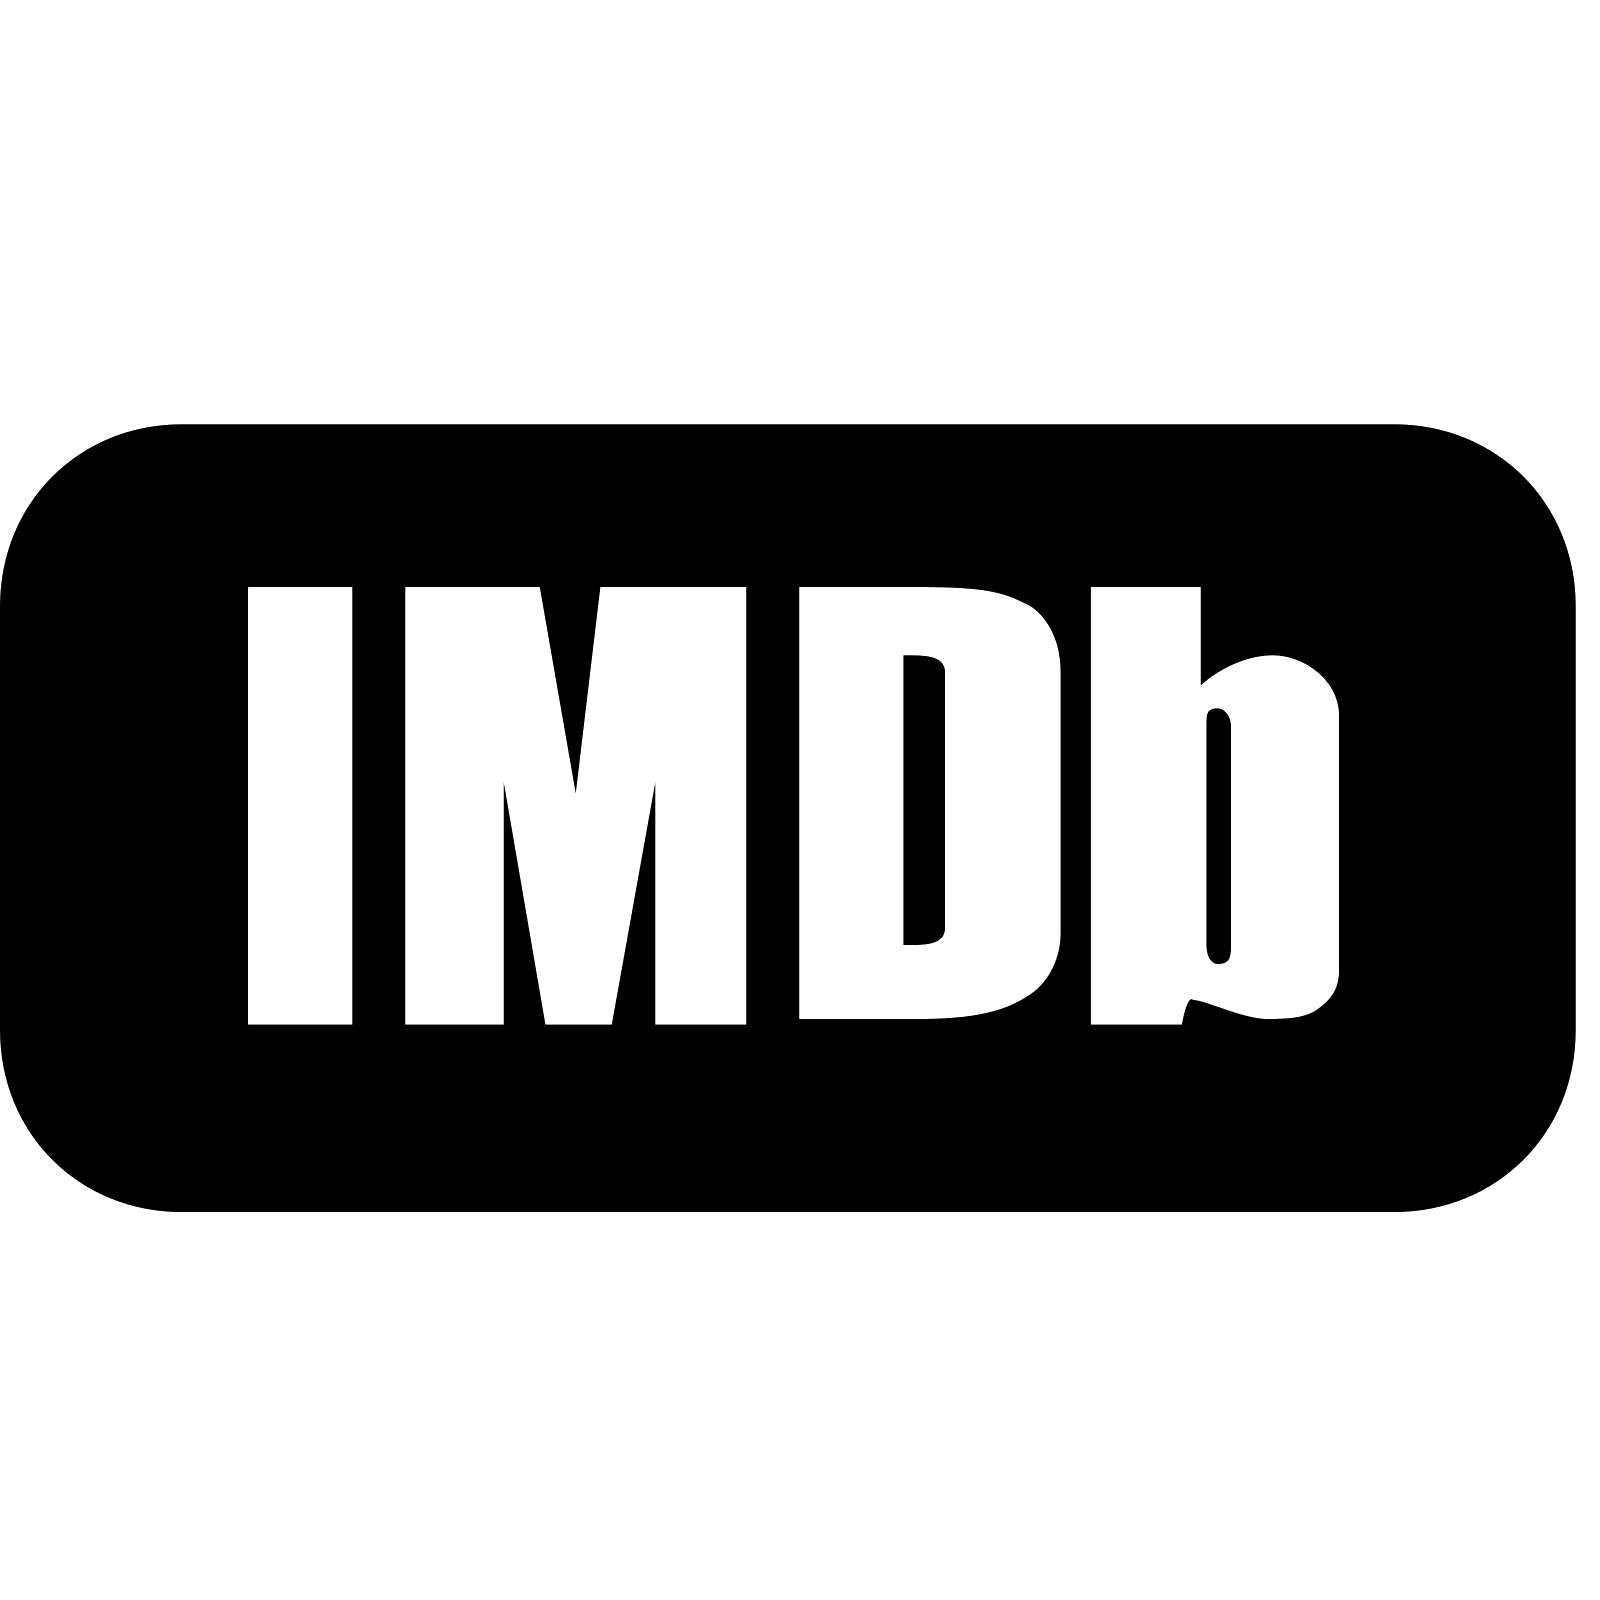 transparent-imdb-logo-2.png